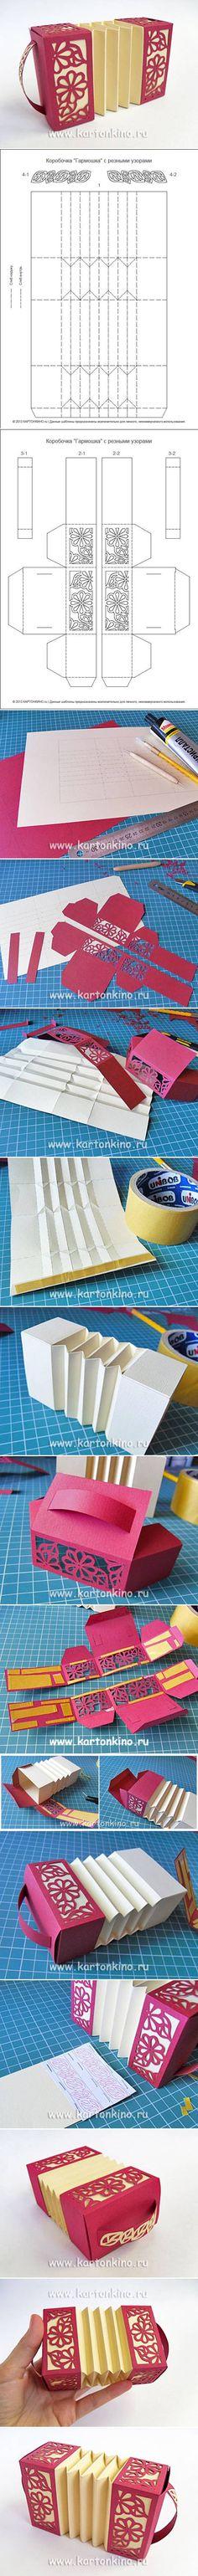 DIY Paper Harmonica Box DIY Paper Harmonica Box